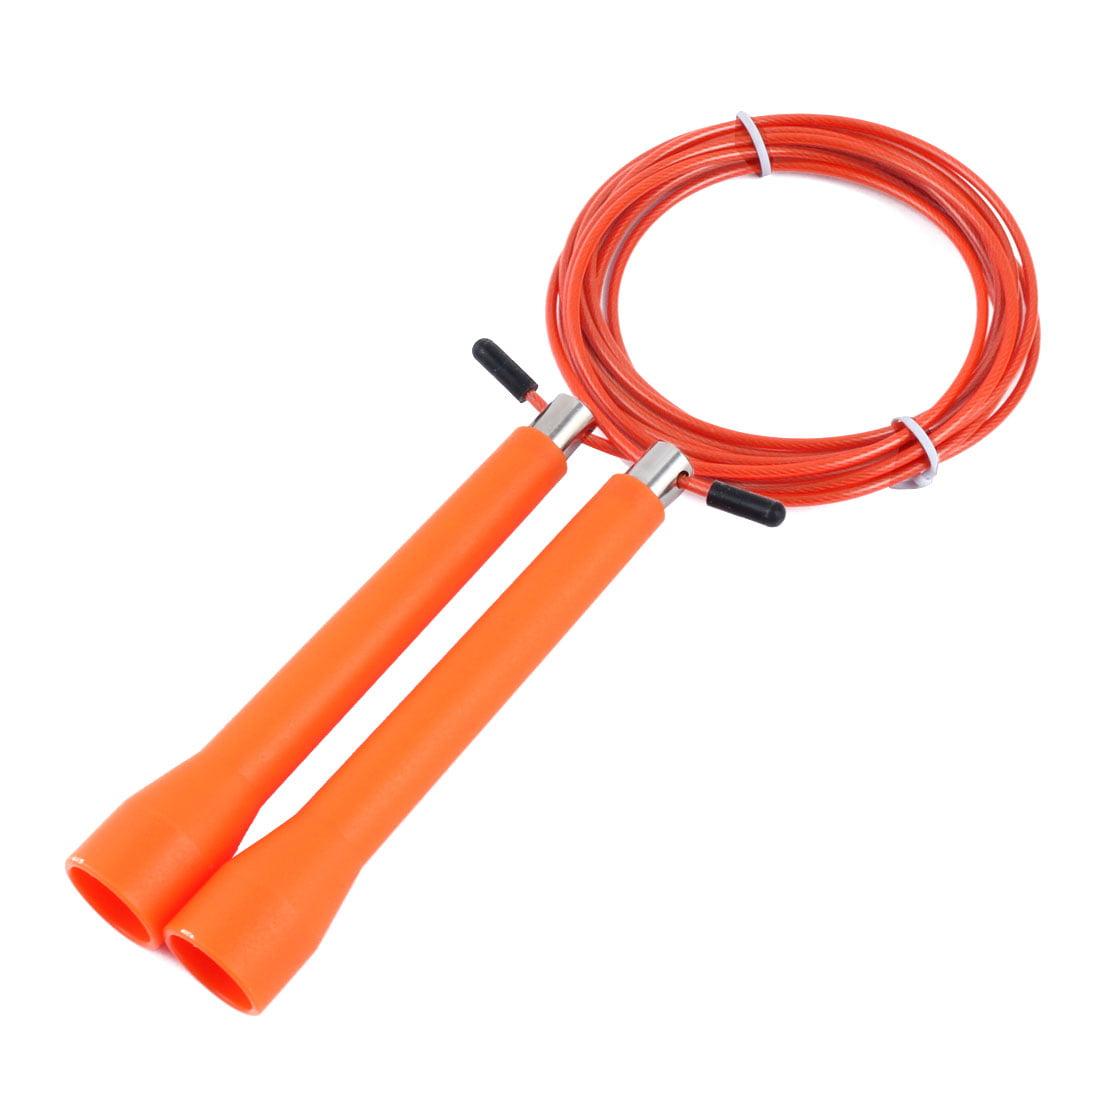 LeTEK Authorized Outdoor Workout Skipping Jump Rope Orange